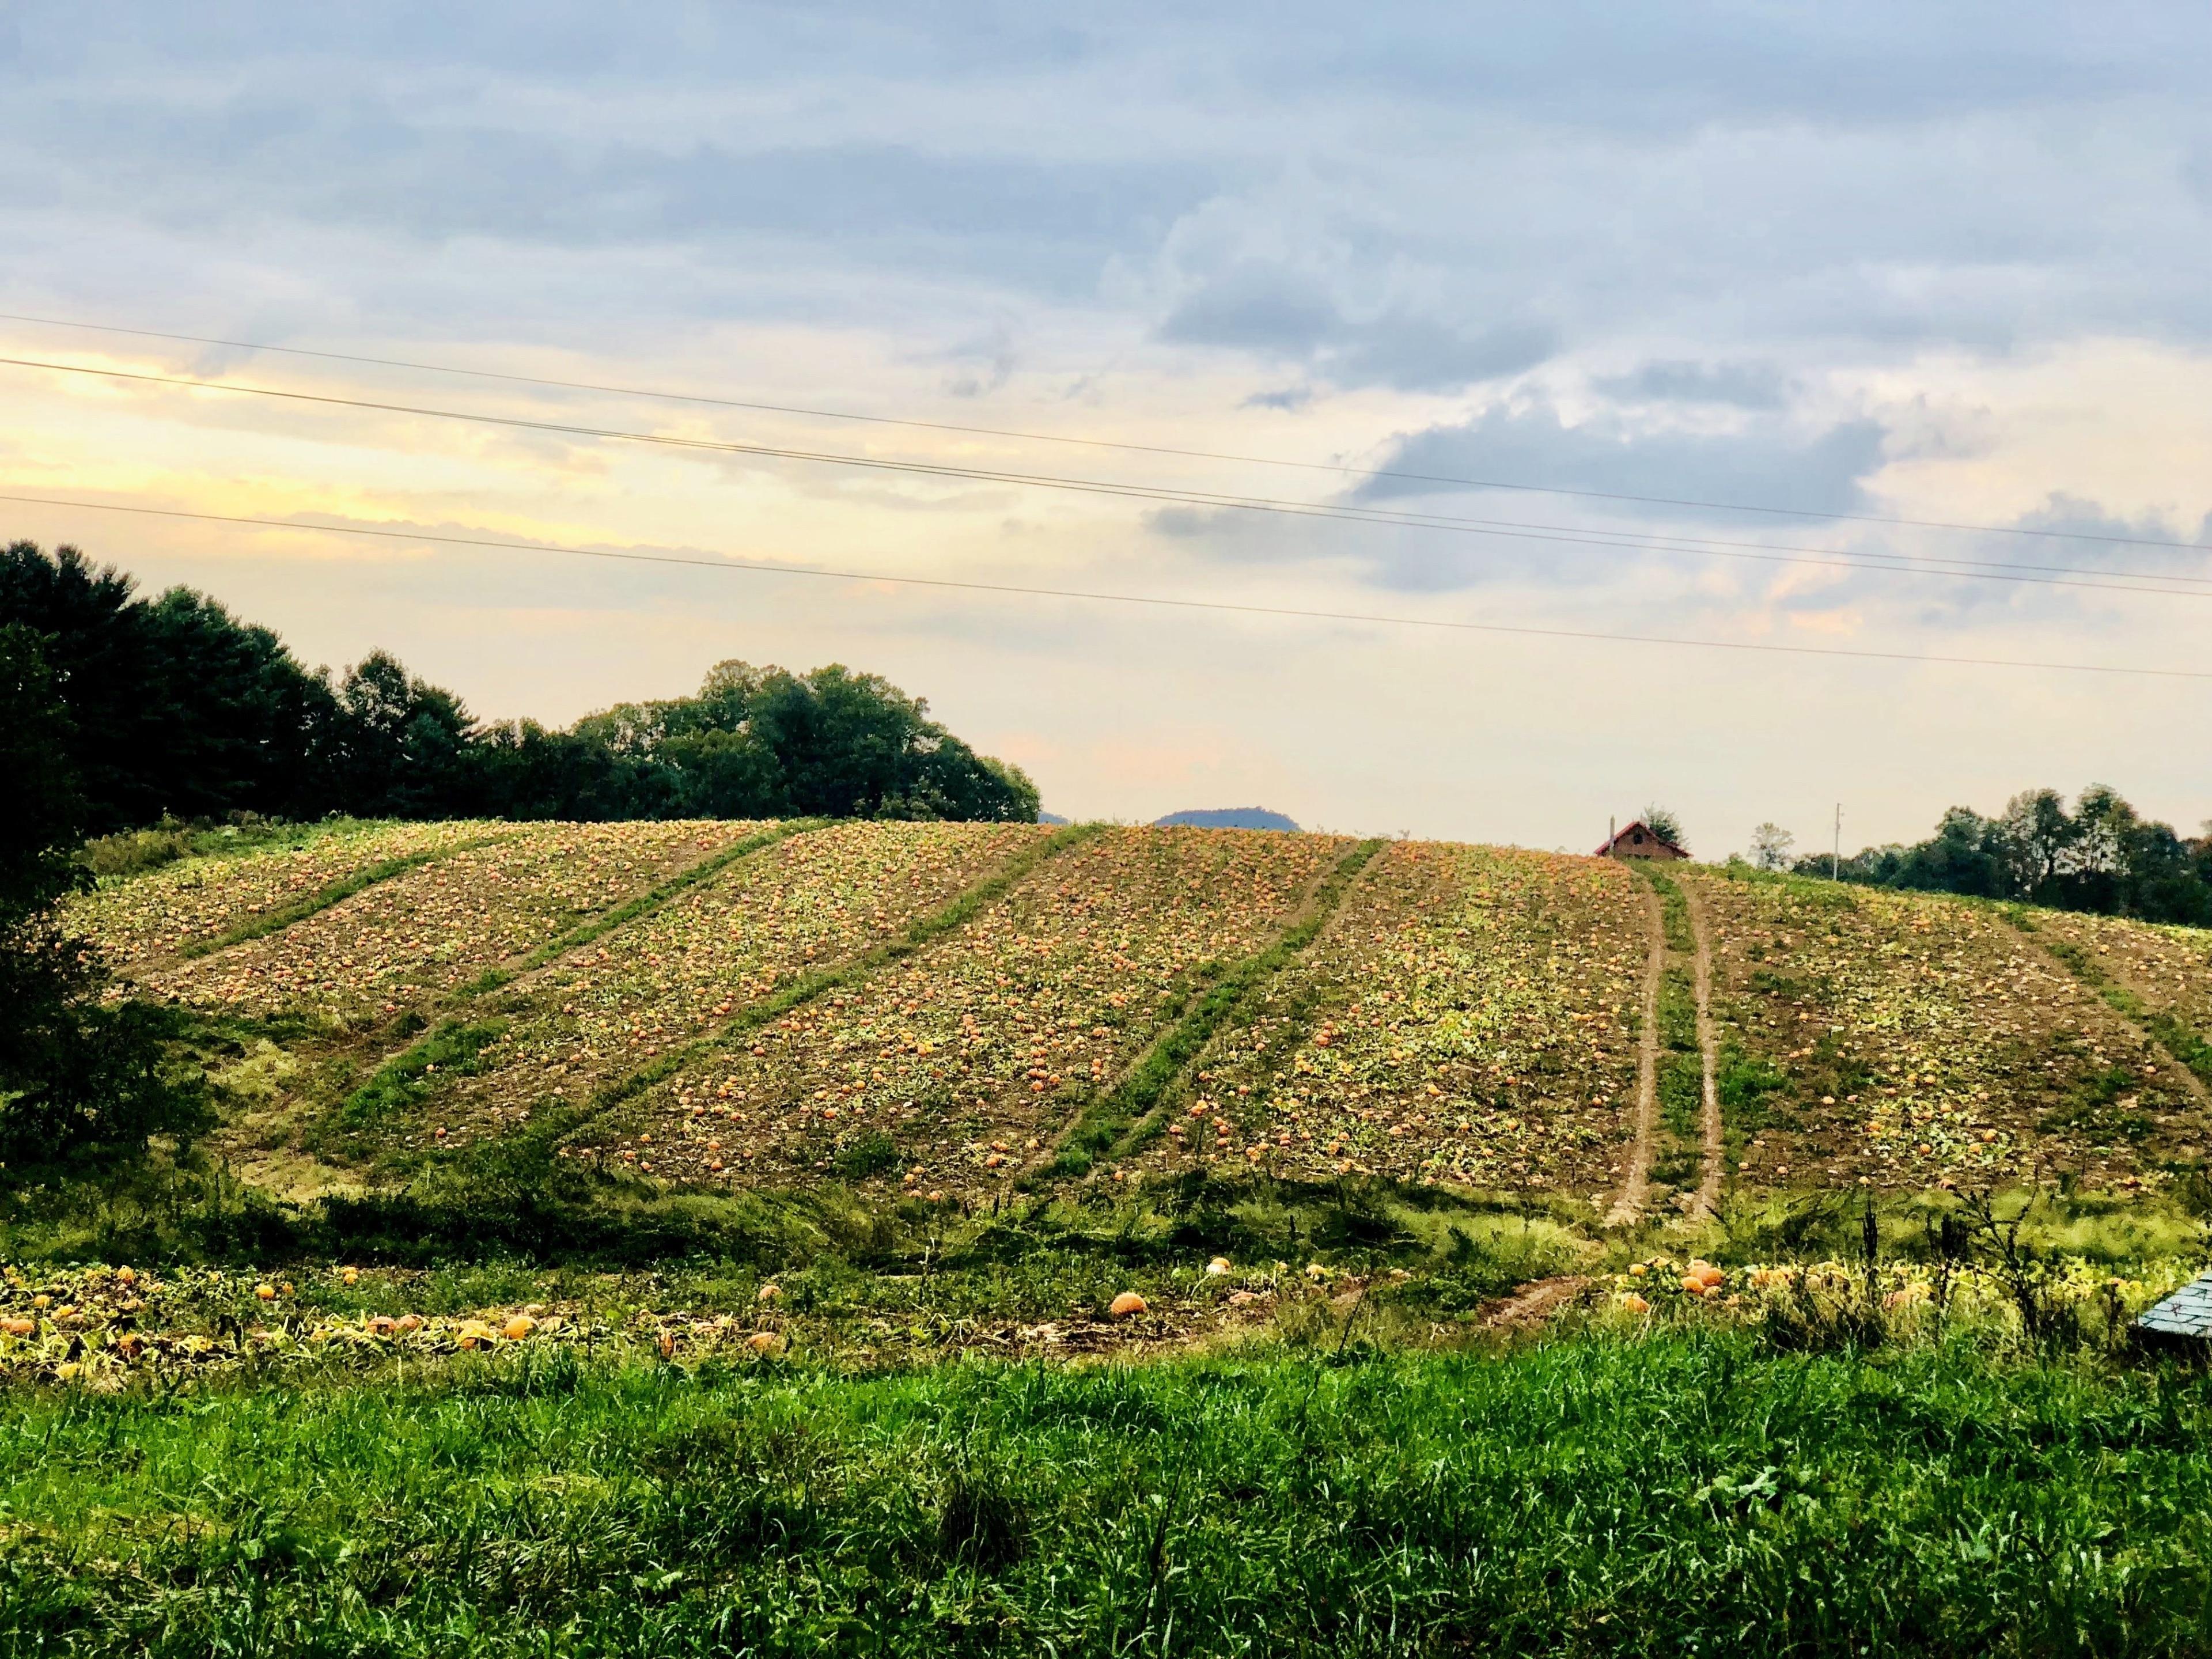 Meadows Of Dan, Virginia, Verenigde Staten